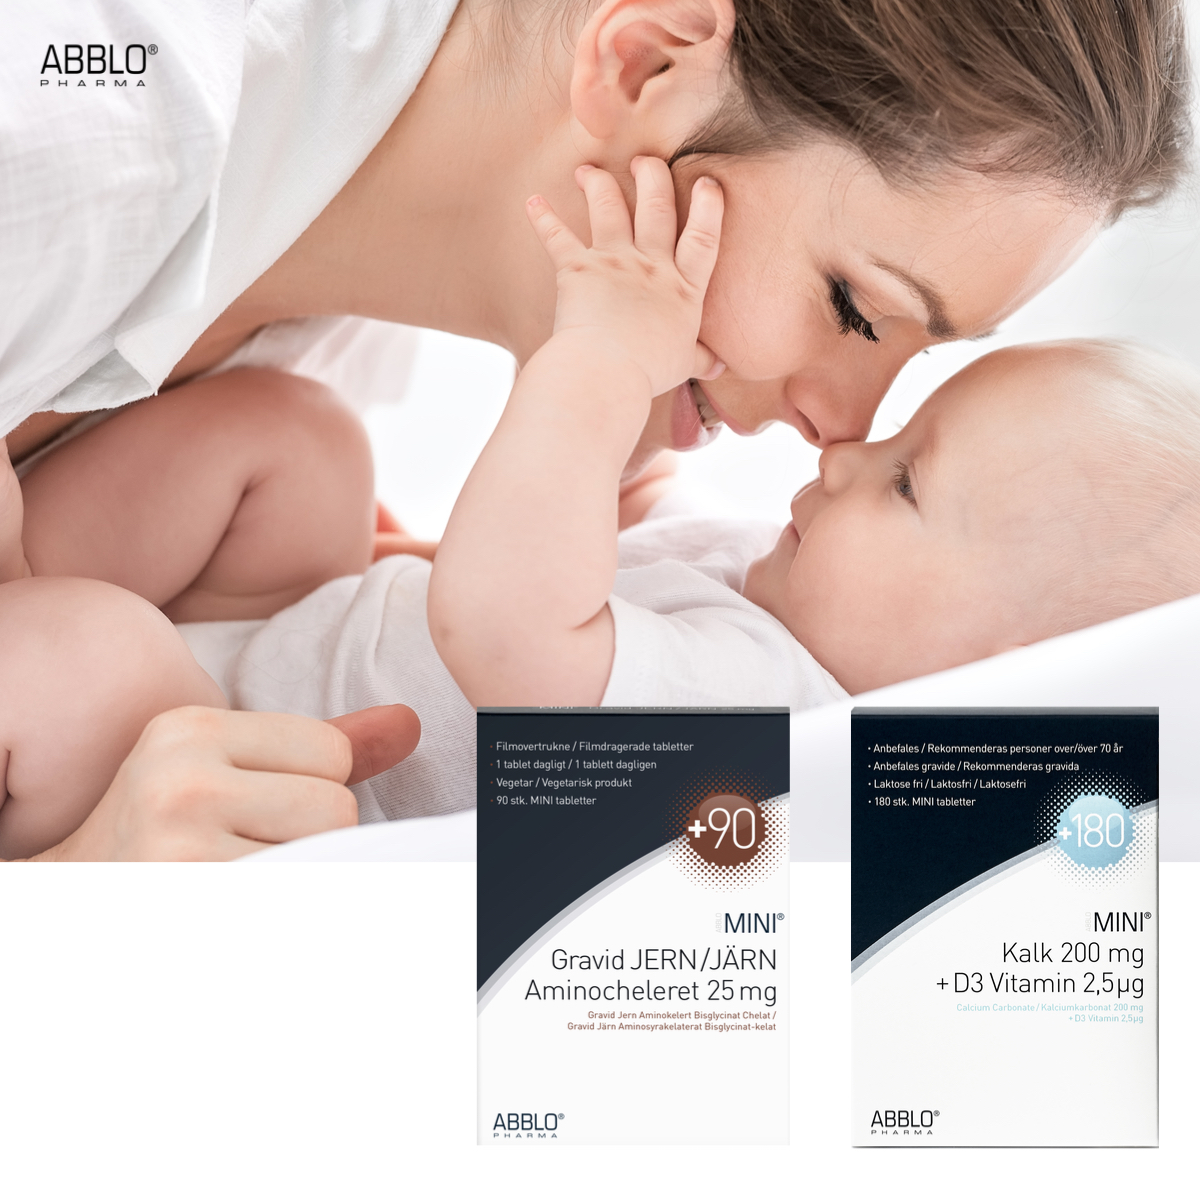 ABBLO_Gravidjern_Baby.jpg